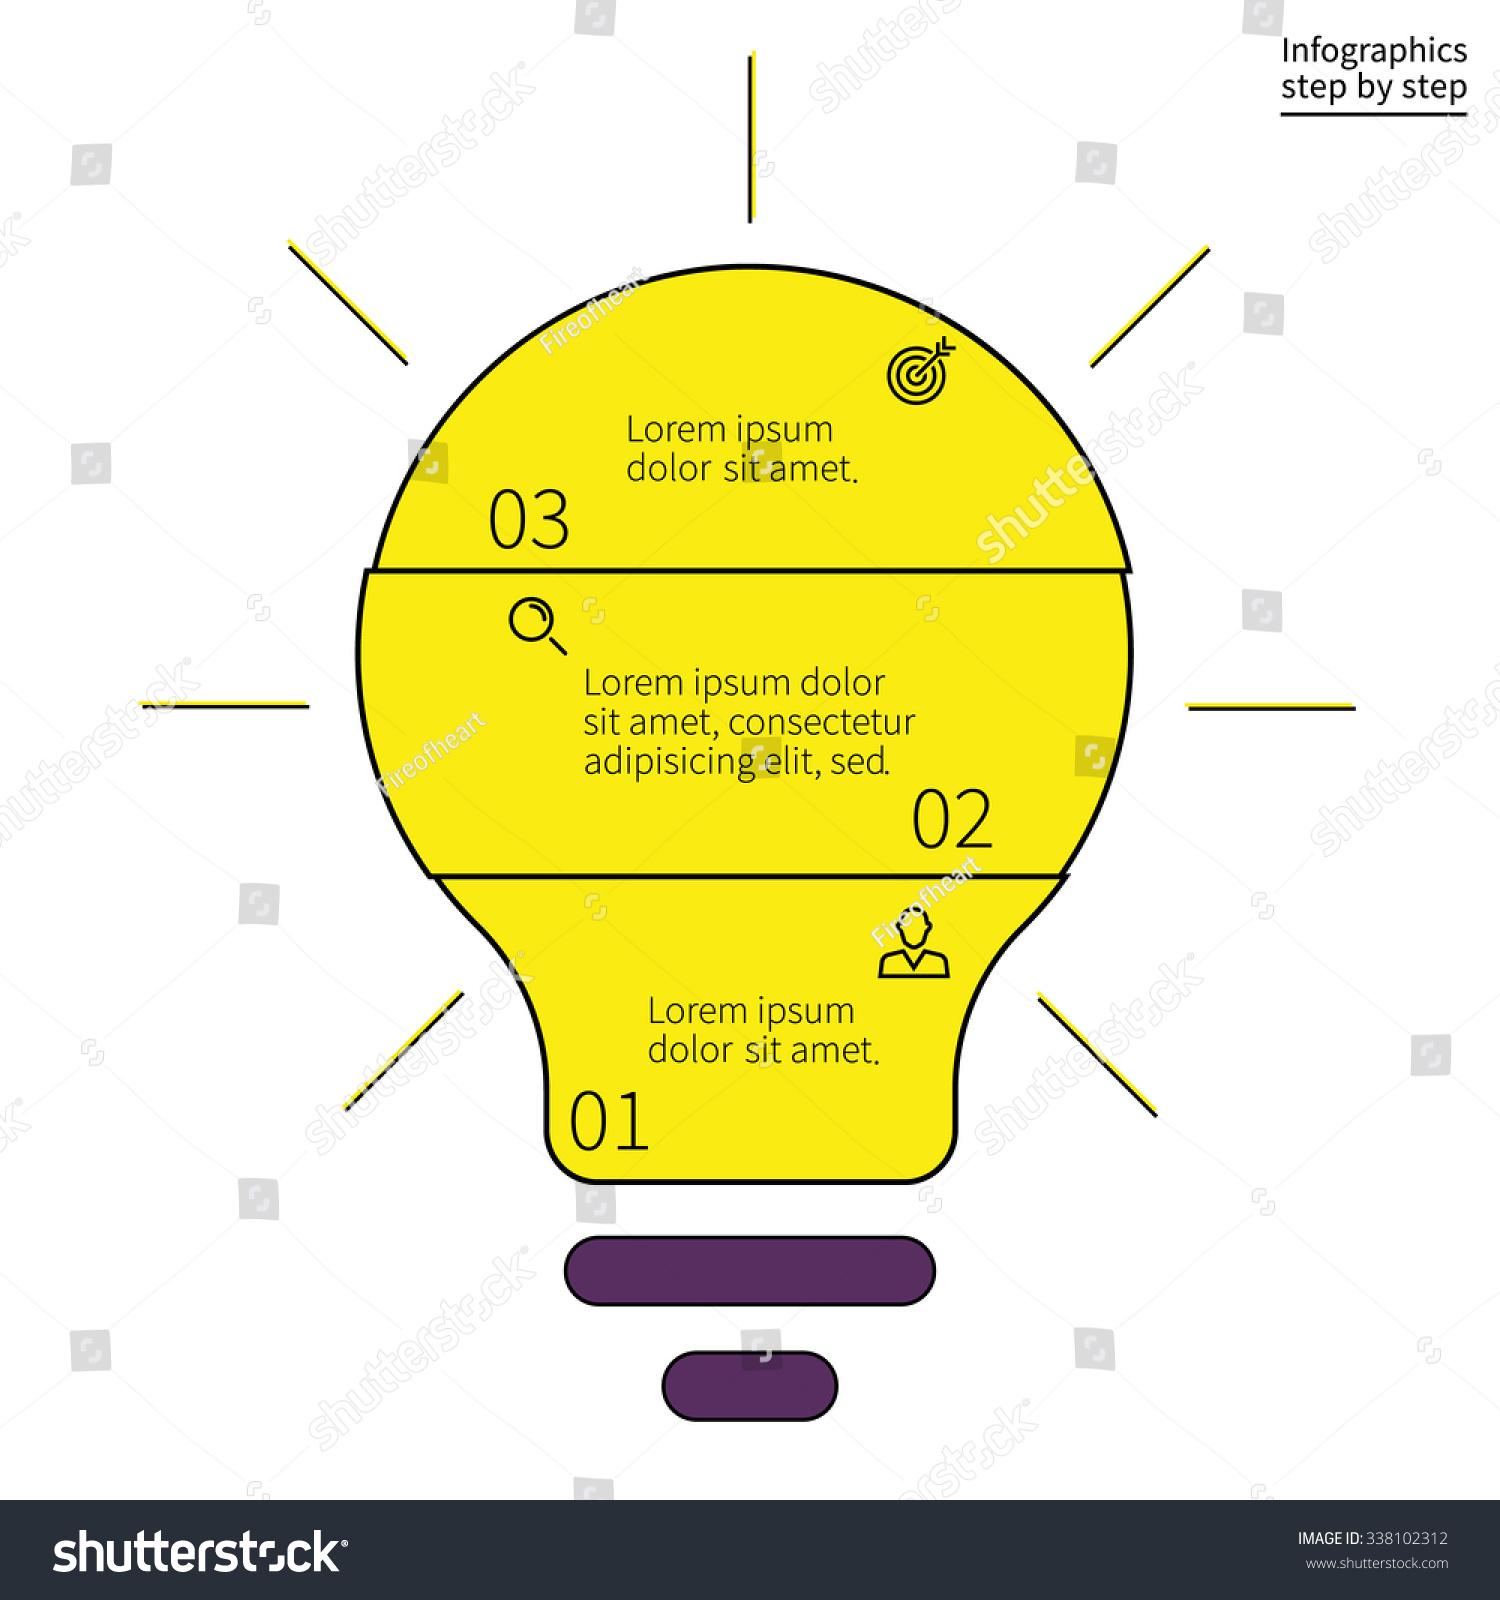 outline infographics step by step form stock vector 338102312 shutterstock. Black Bedroom Furniture Sets. Home Design Ideas